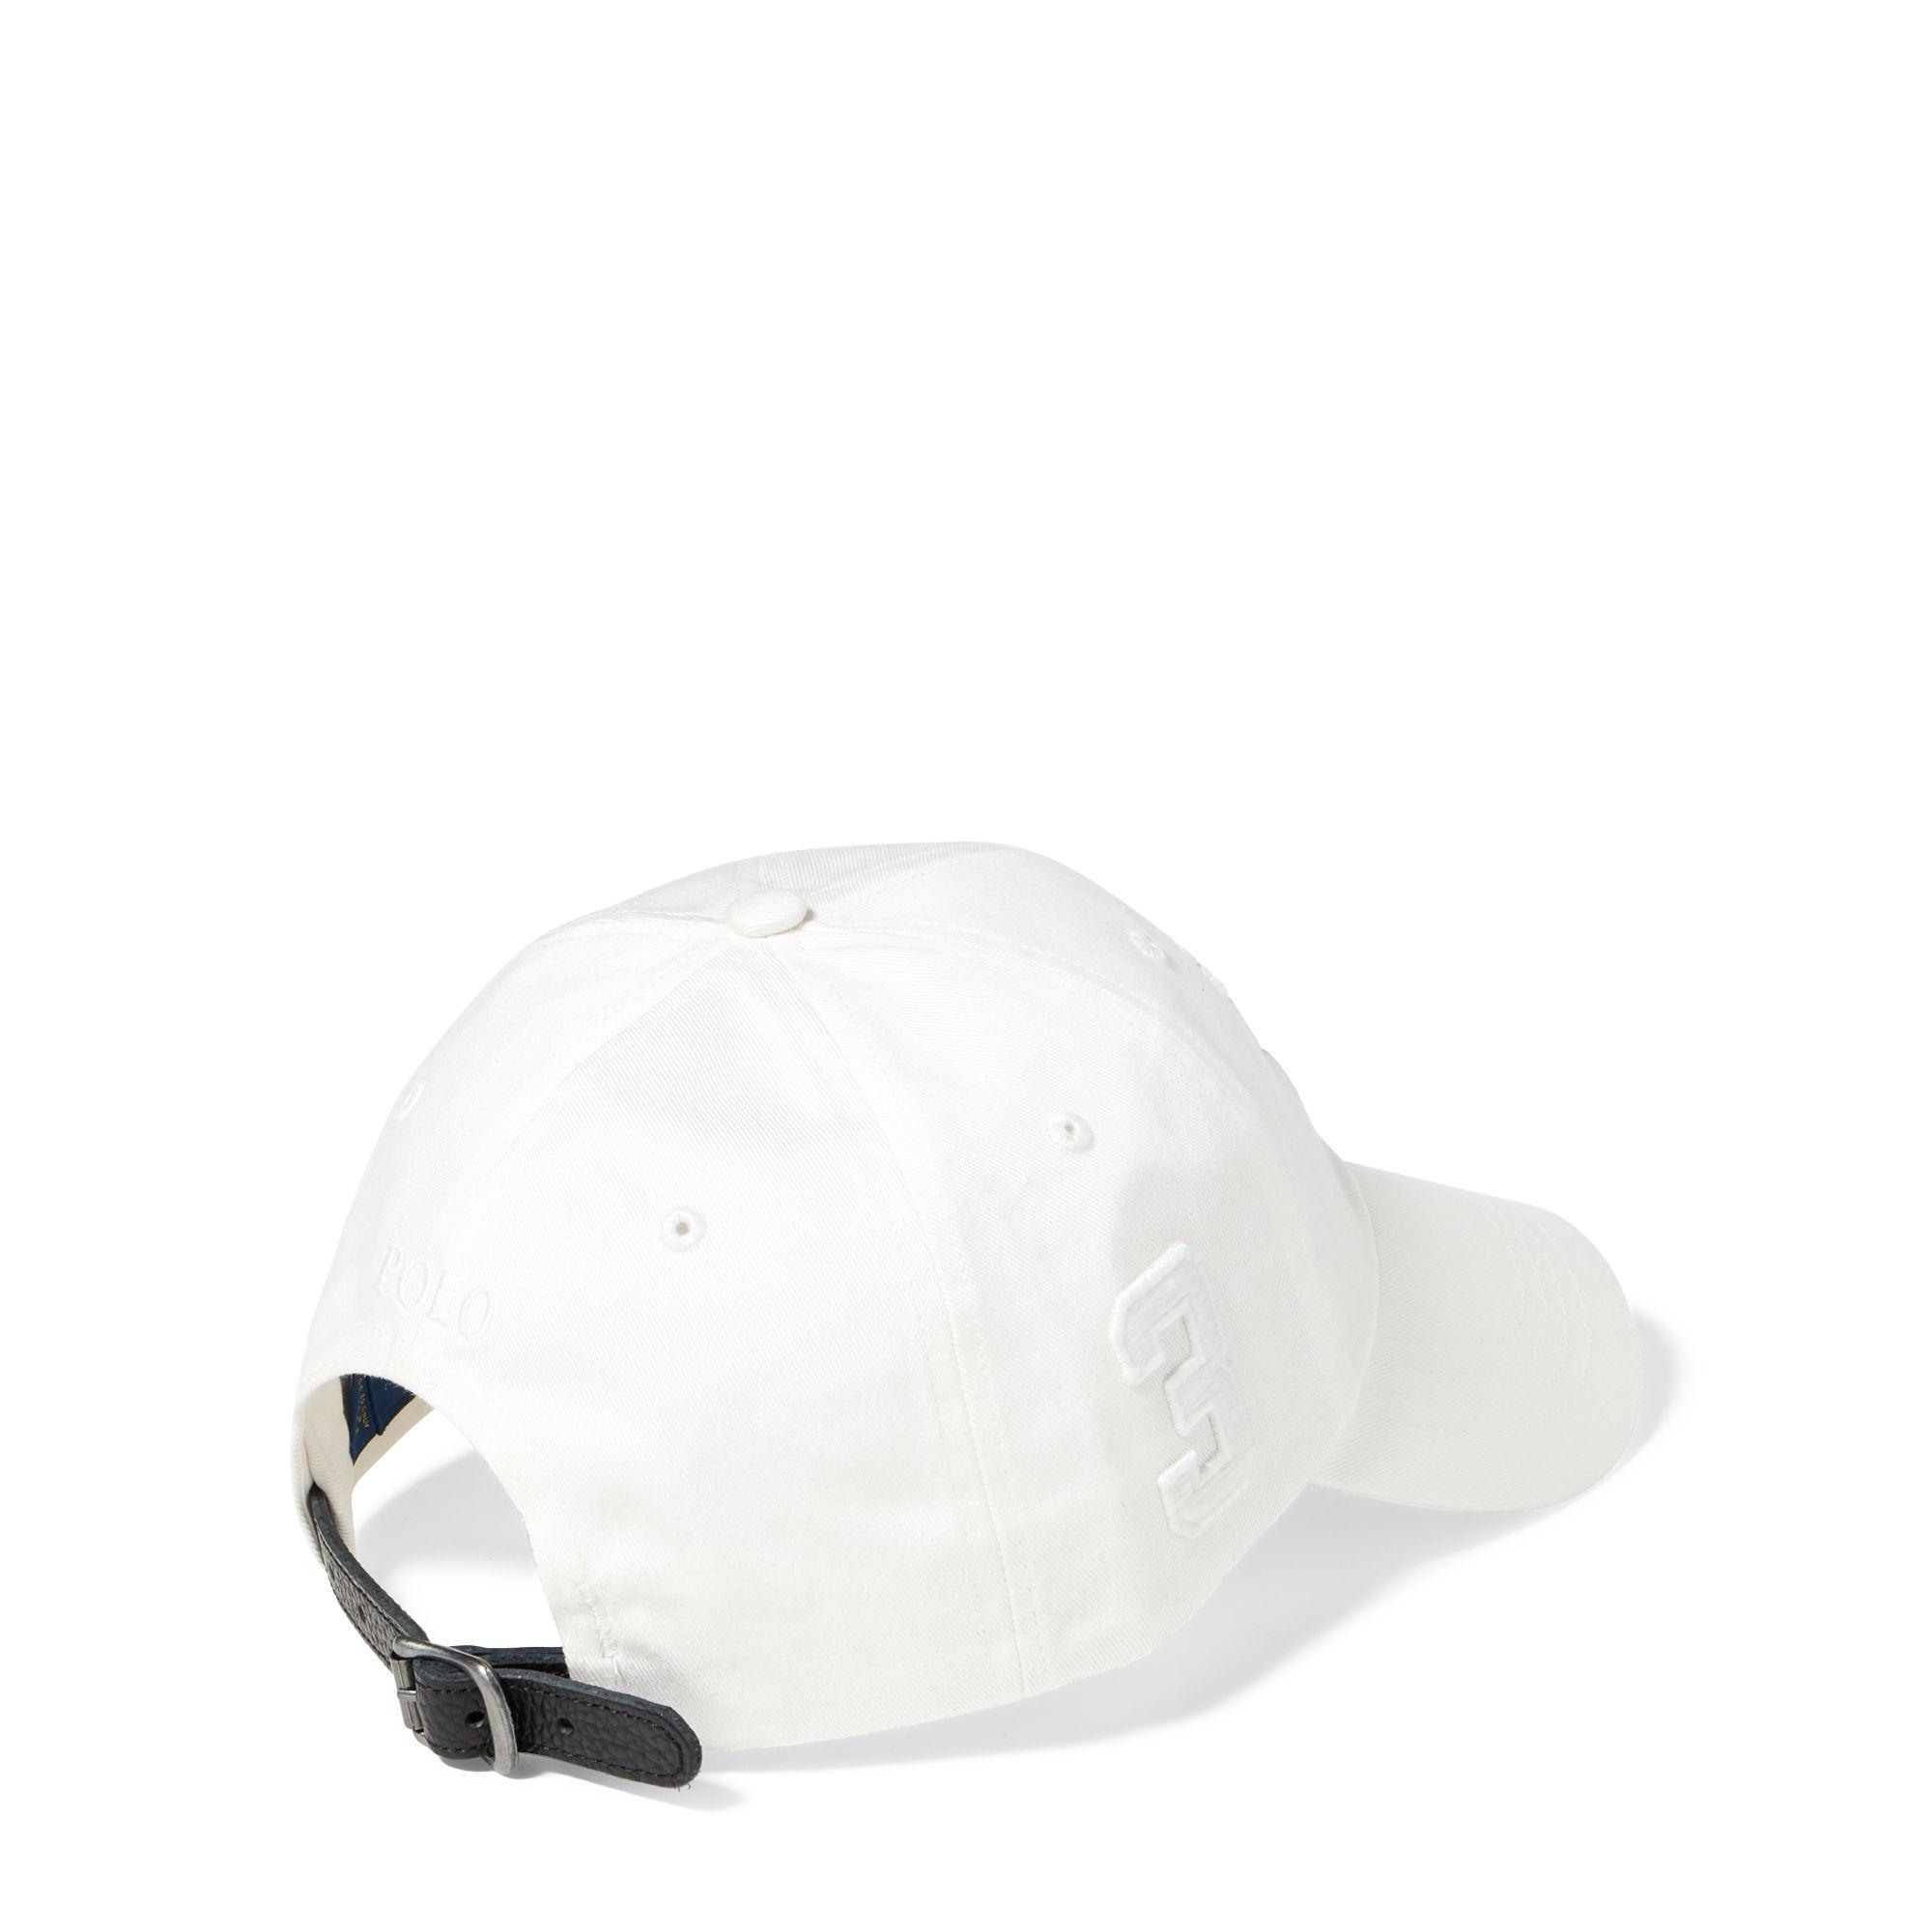 a65c880c Polo Ralph Lauren - White Mens Cotton Chino Baseball Cap for Men - Lyst.  View fullscreen